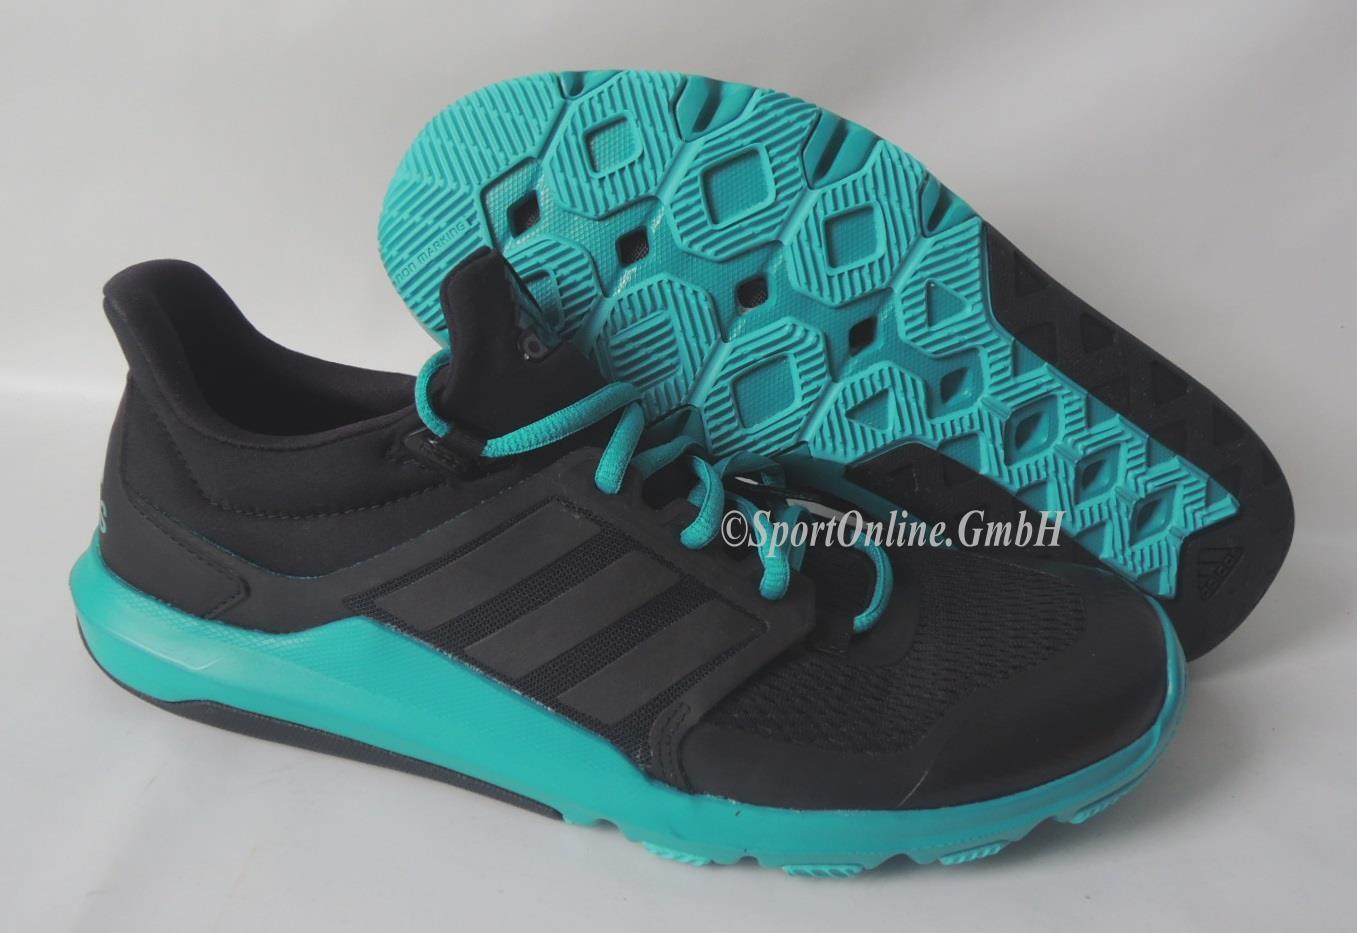 NEU adidas adipure 360.3 360.3 360.3 M Größe 46 Training Fitness Workout Schuhe AF5462 TOP  | New Listing  dc9ec5